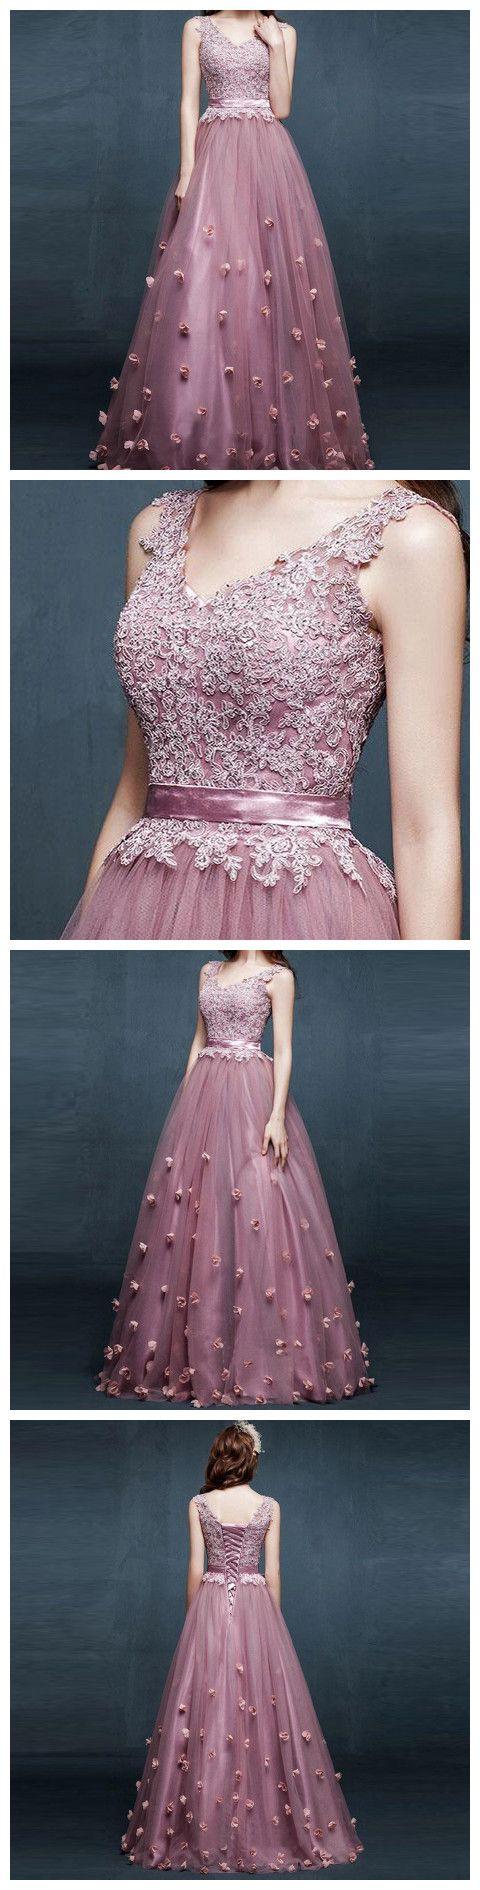 A-LINE V-NECK TULLE APPLIQUES PROM DRESS/EVENING DRESSES